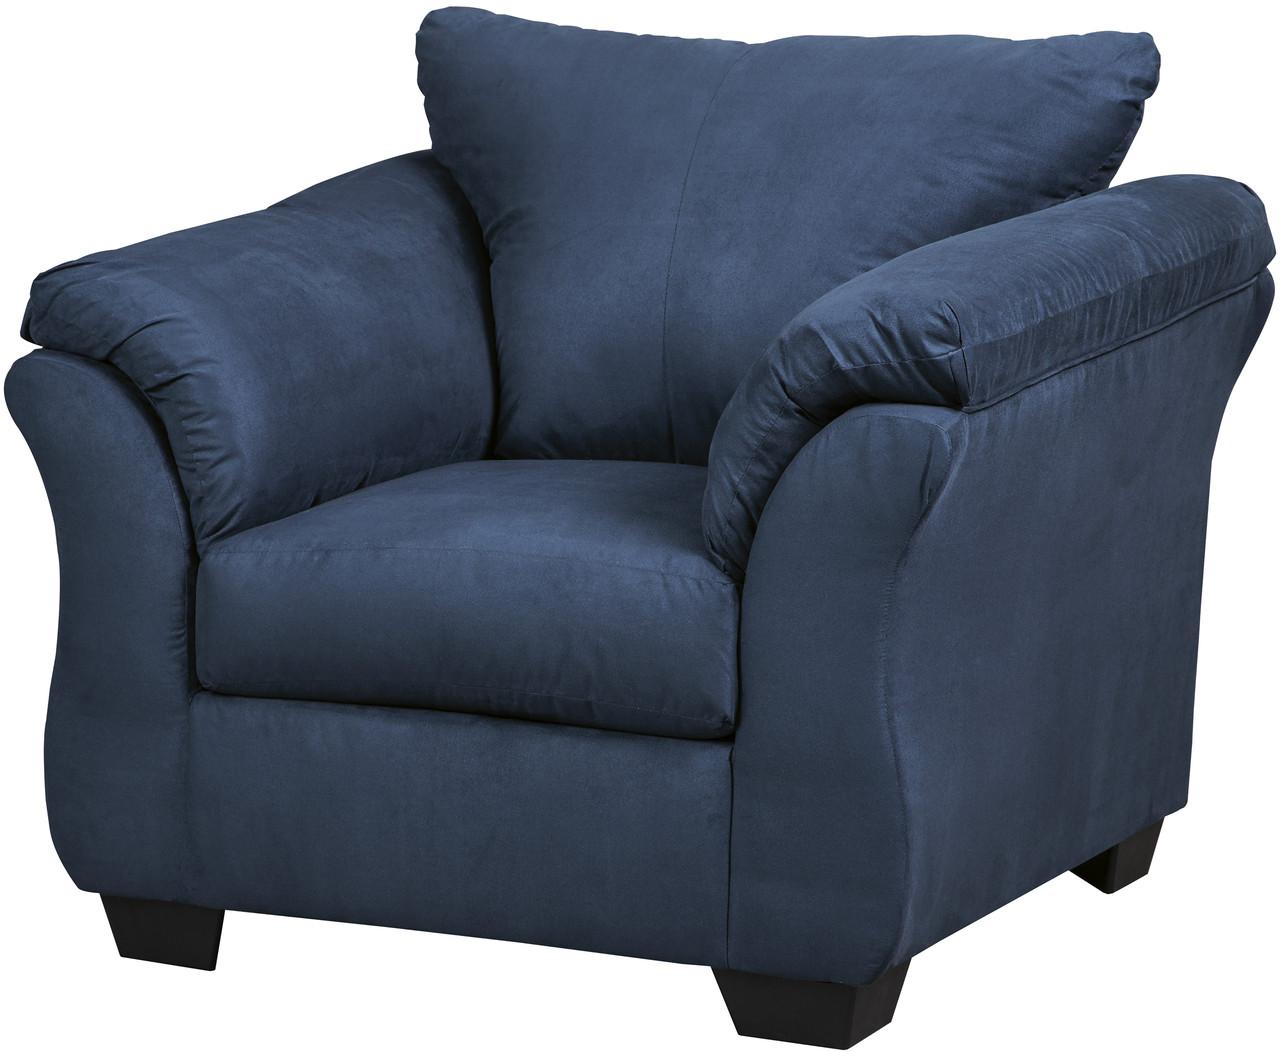 Terrific Edeline Royal Blue Plush Chair Pdpeps Interior Chair Design Pdpepsorg